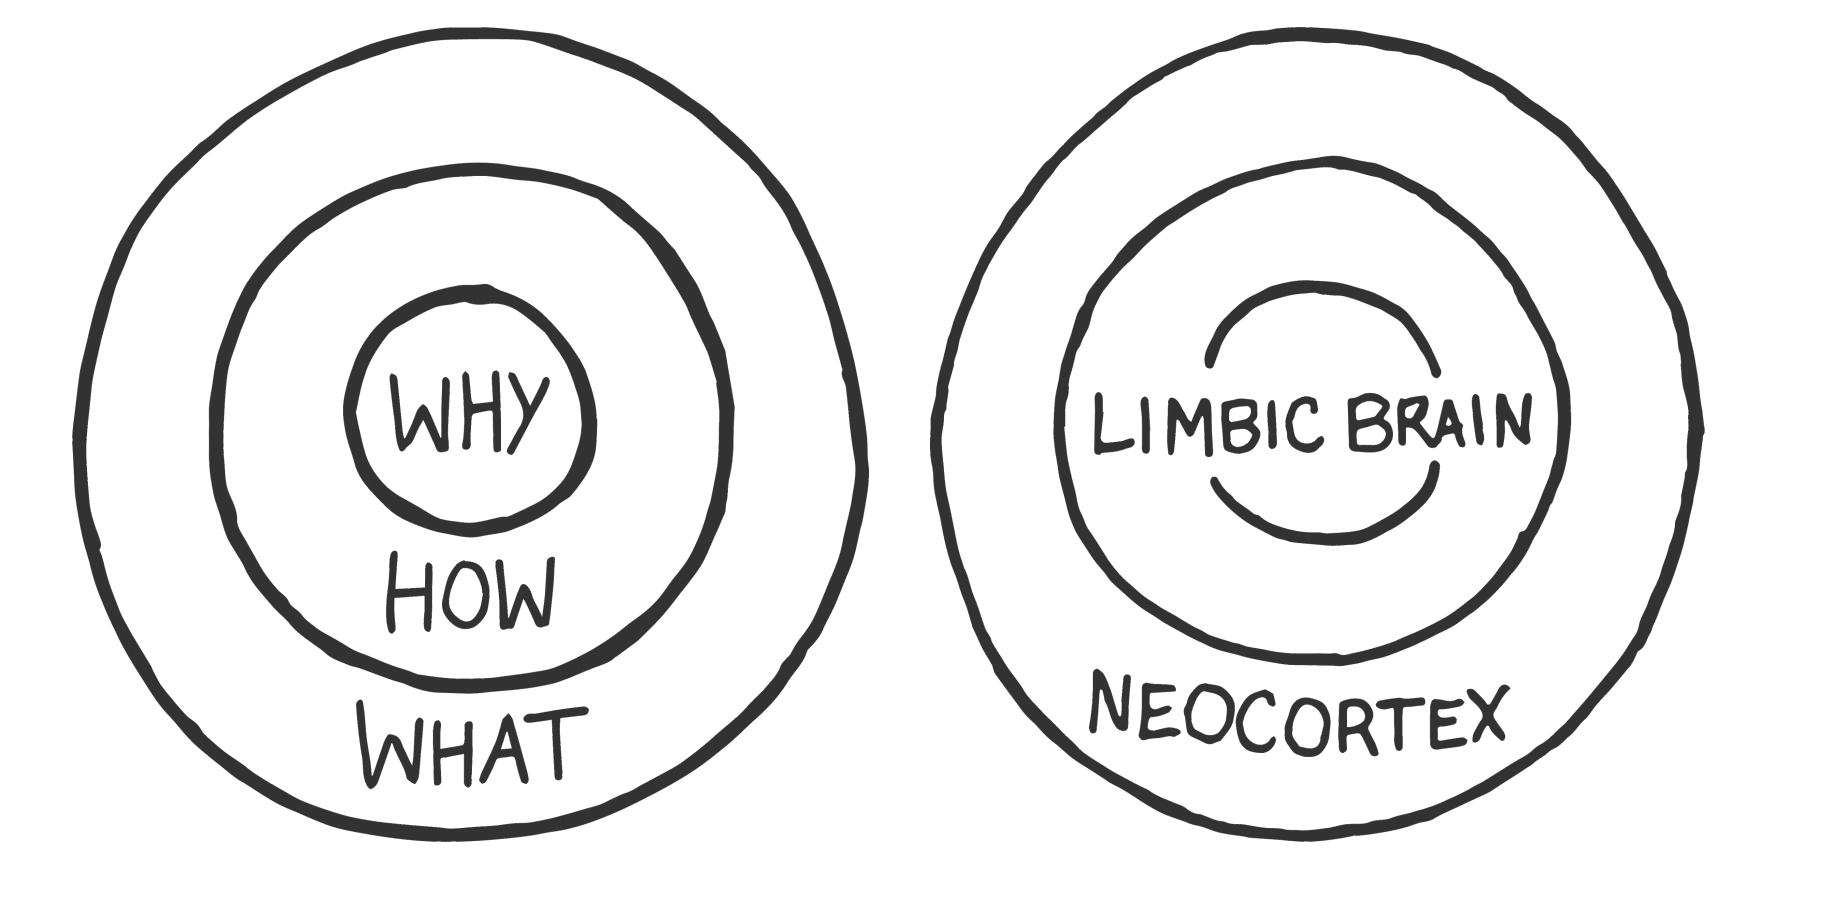 altin-cember-the-golden-circle-limbic-sistem